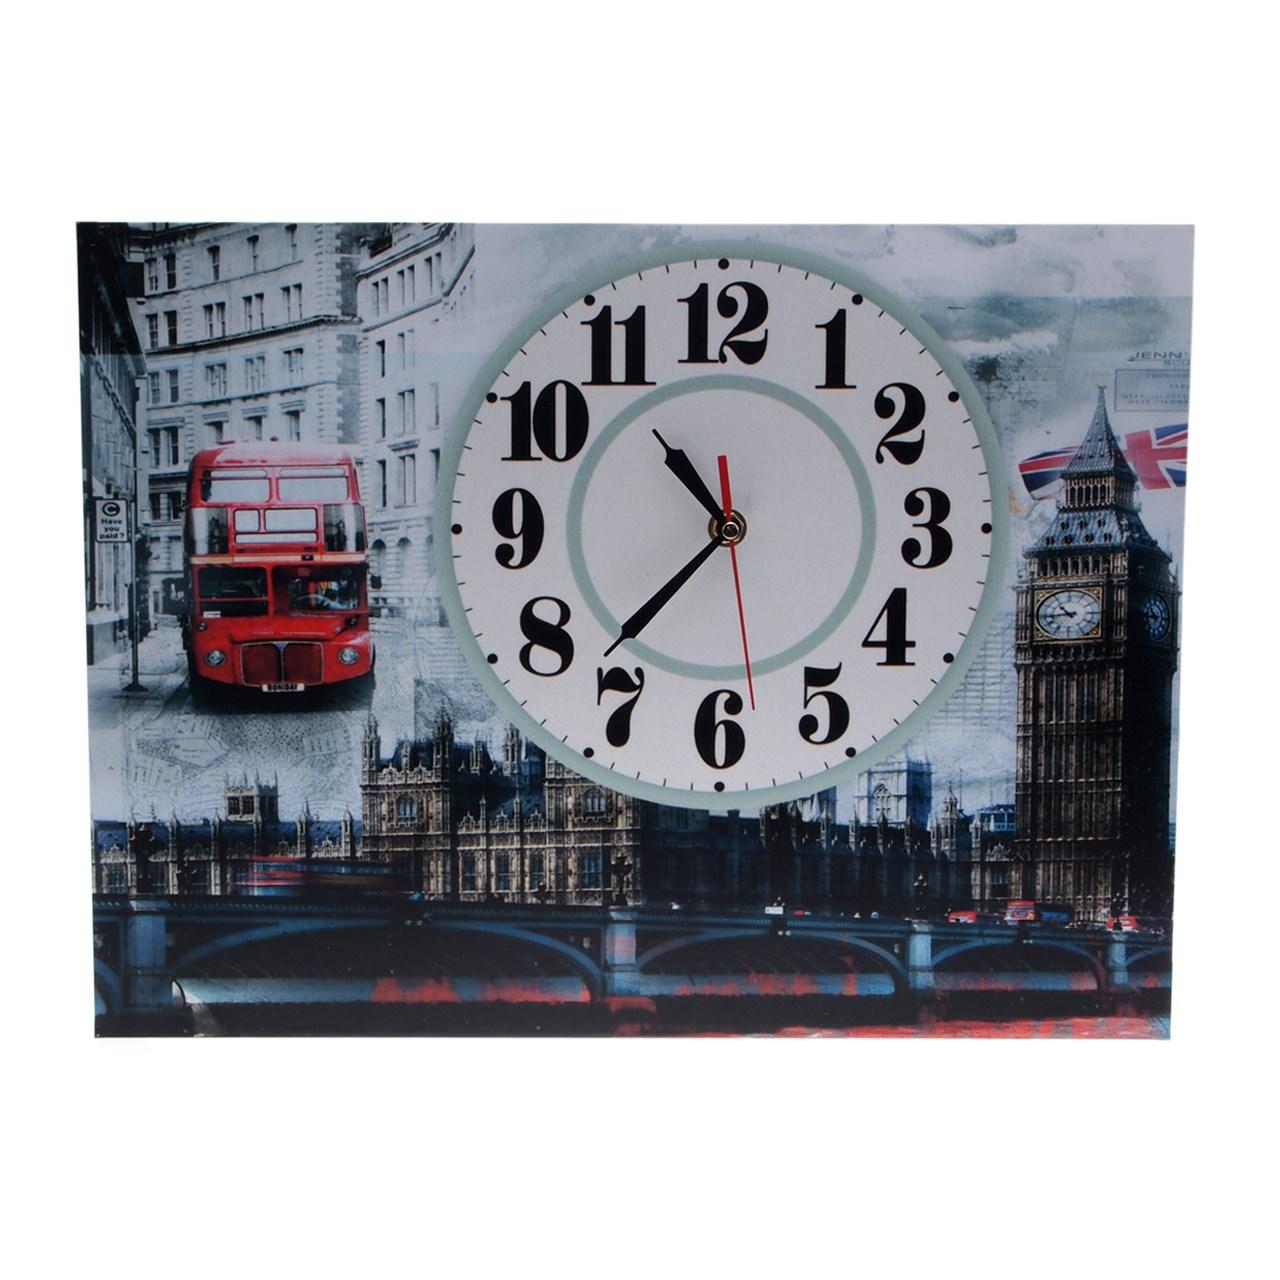 ساعت دیواری مدل London View 1